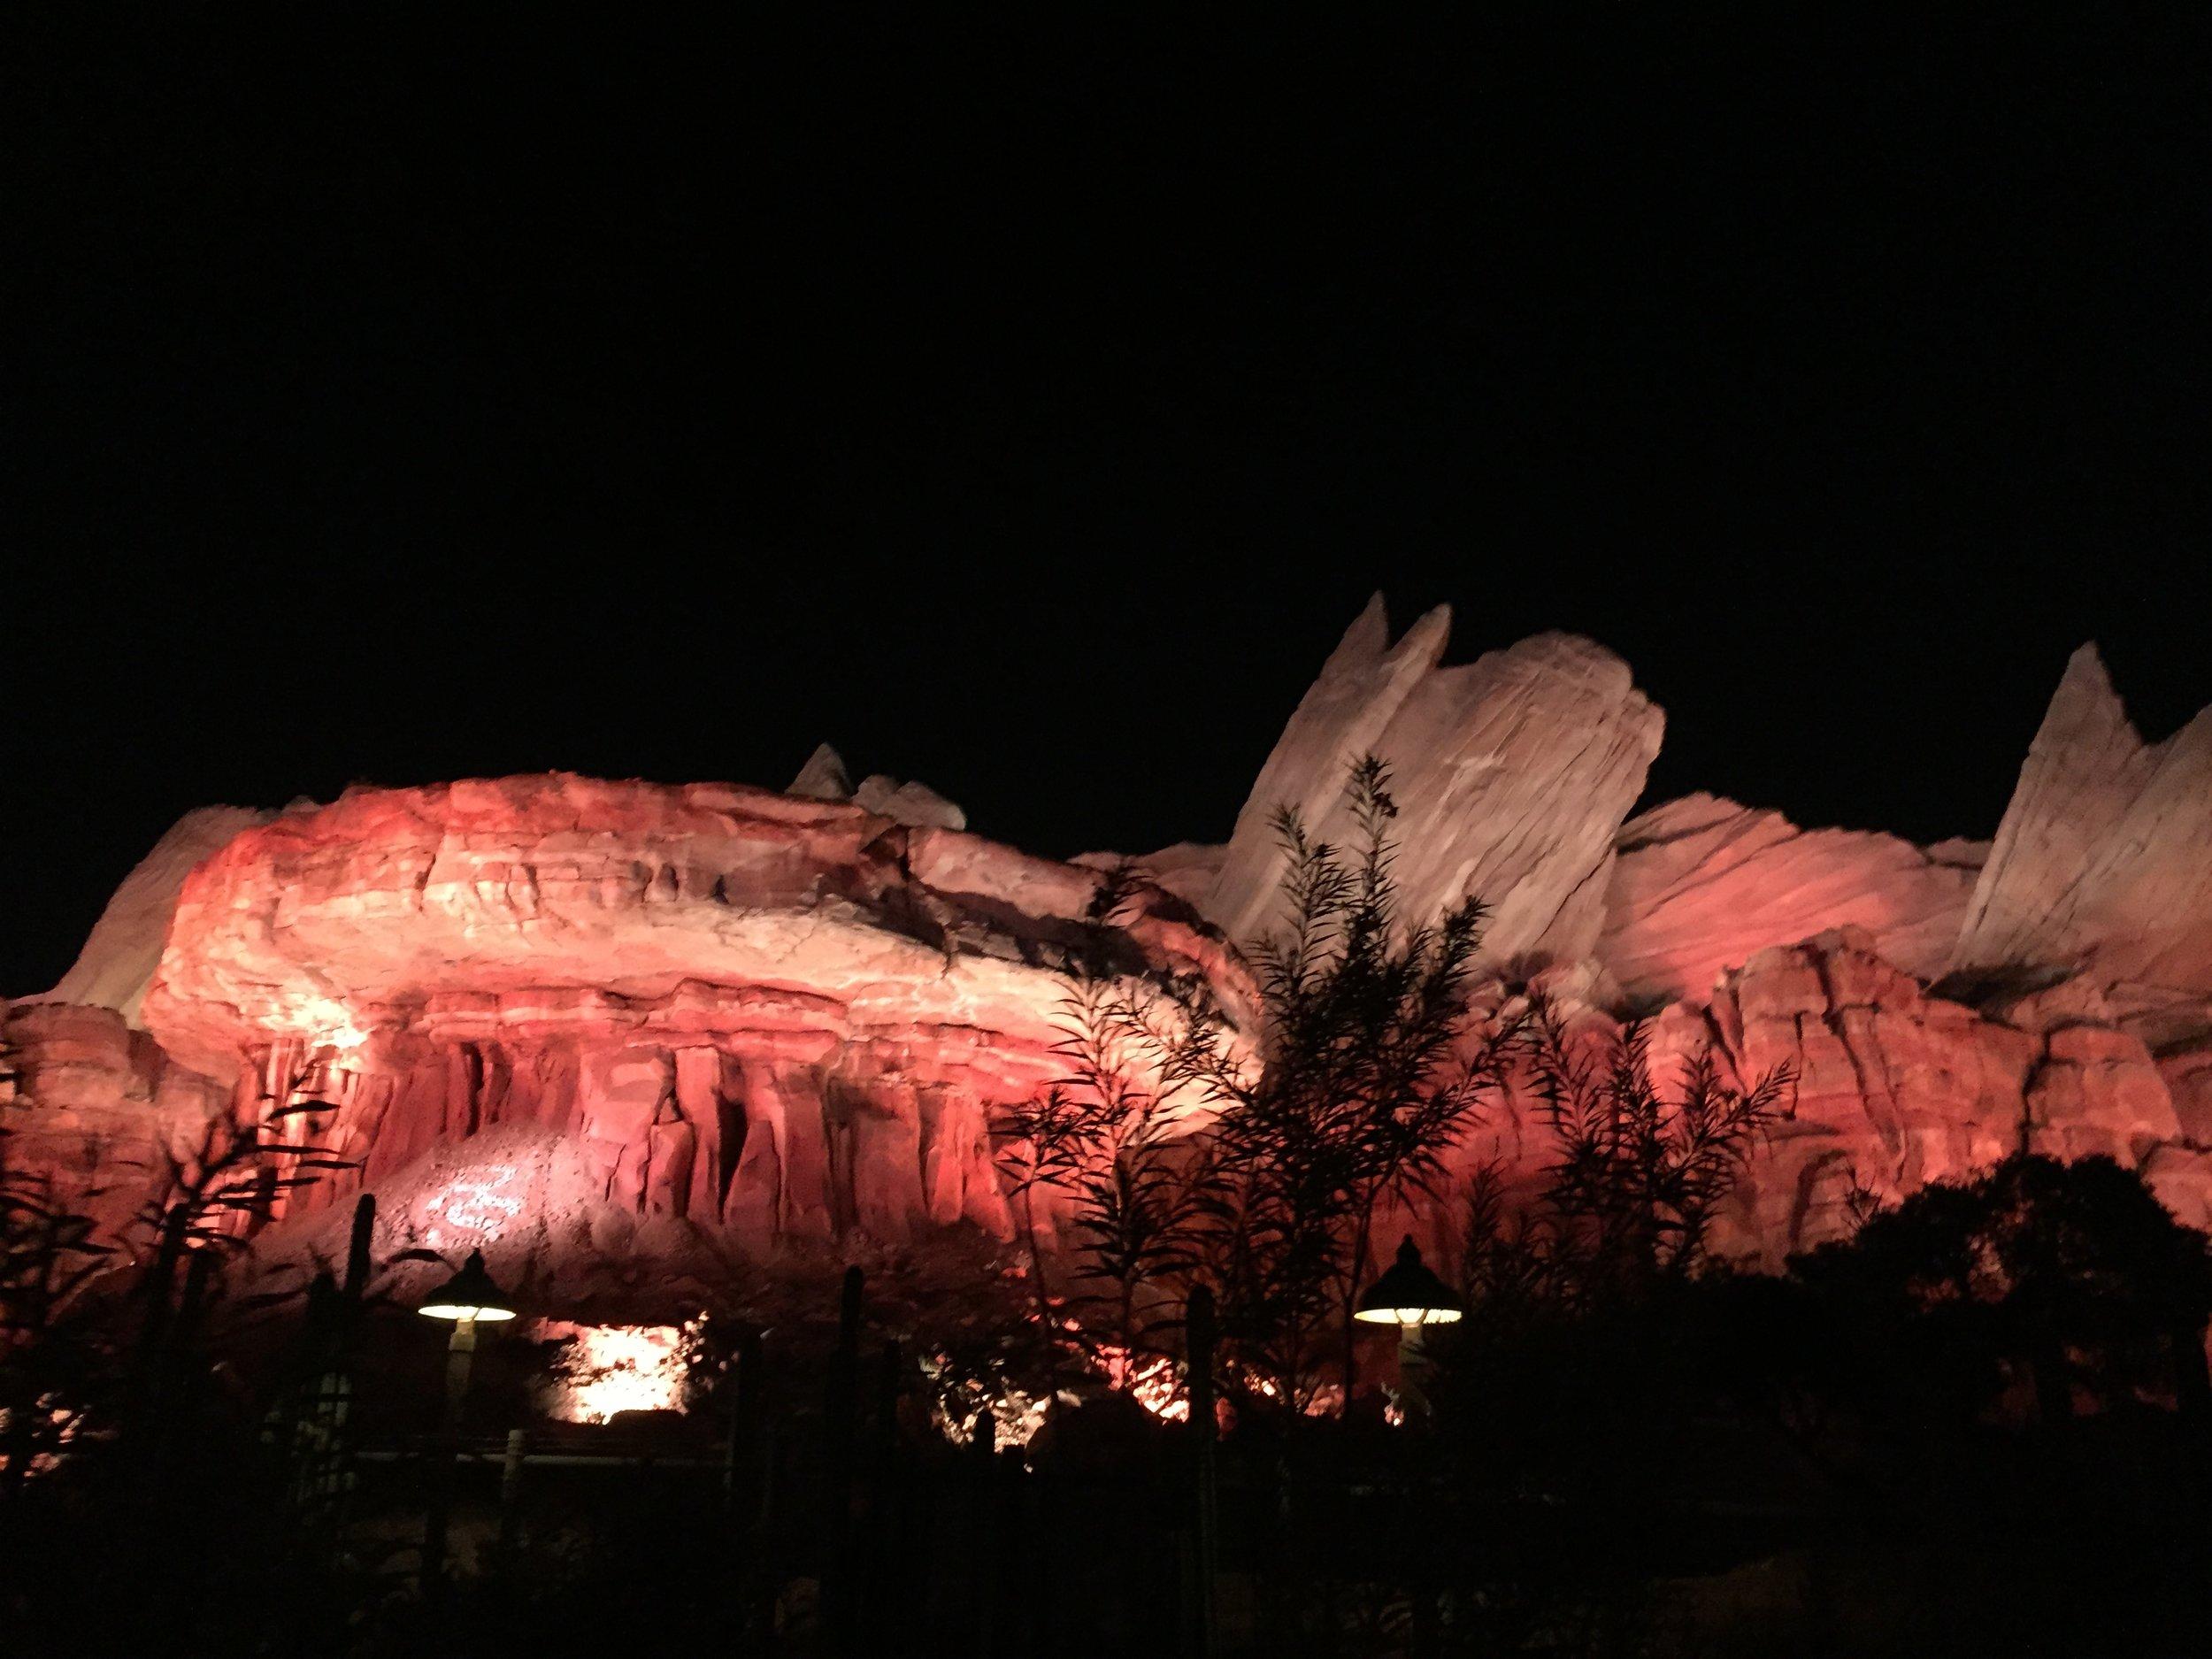 Disneyland, Disney, Disney Trip, Disney Vacation, California Adventure, Disney Princesses, Thor, Jedi Training, Dole Whip, Radiator Springs Racers, World of Color,